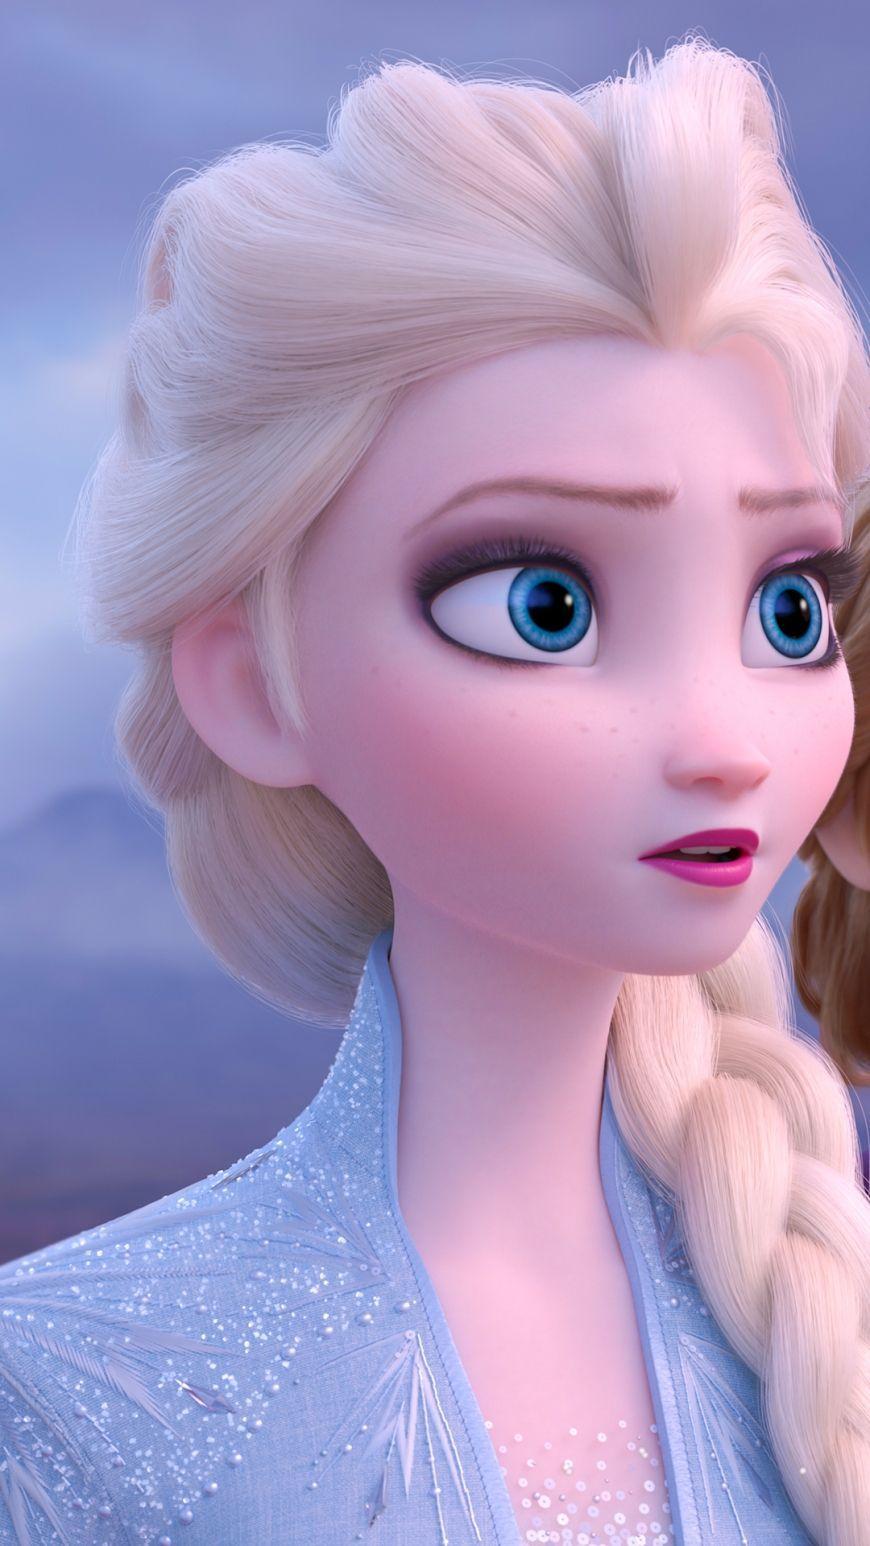 Disney Frozen 2 Mobile Phone Wallpapers Disneyprincess Disney